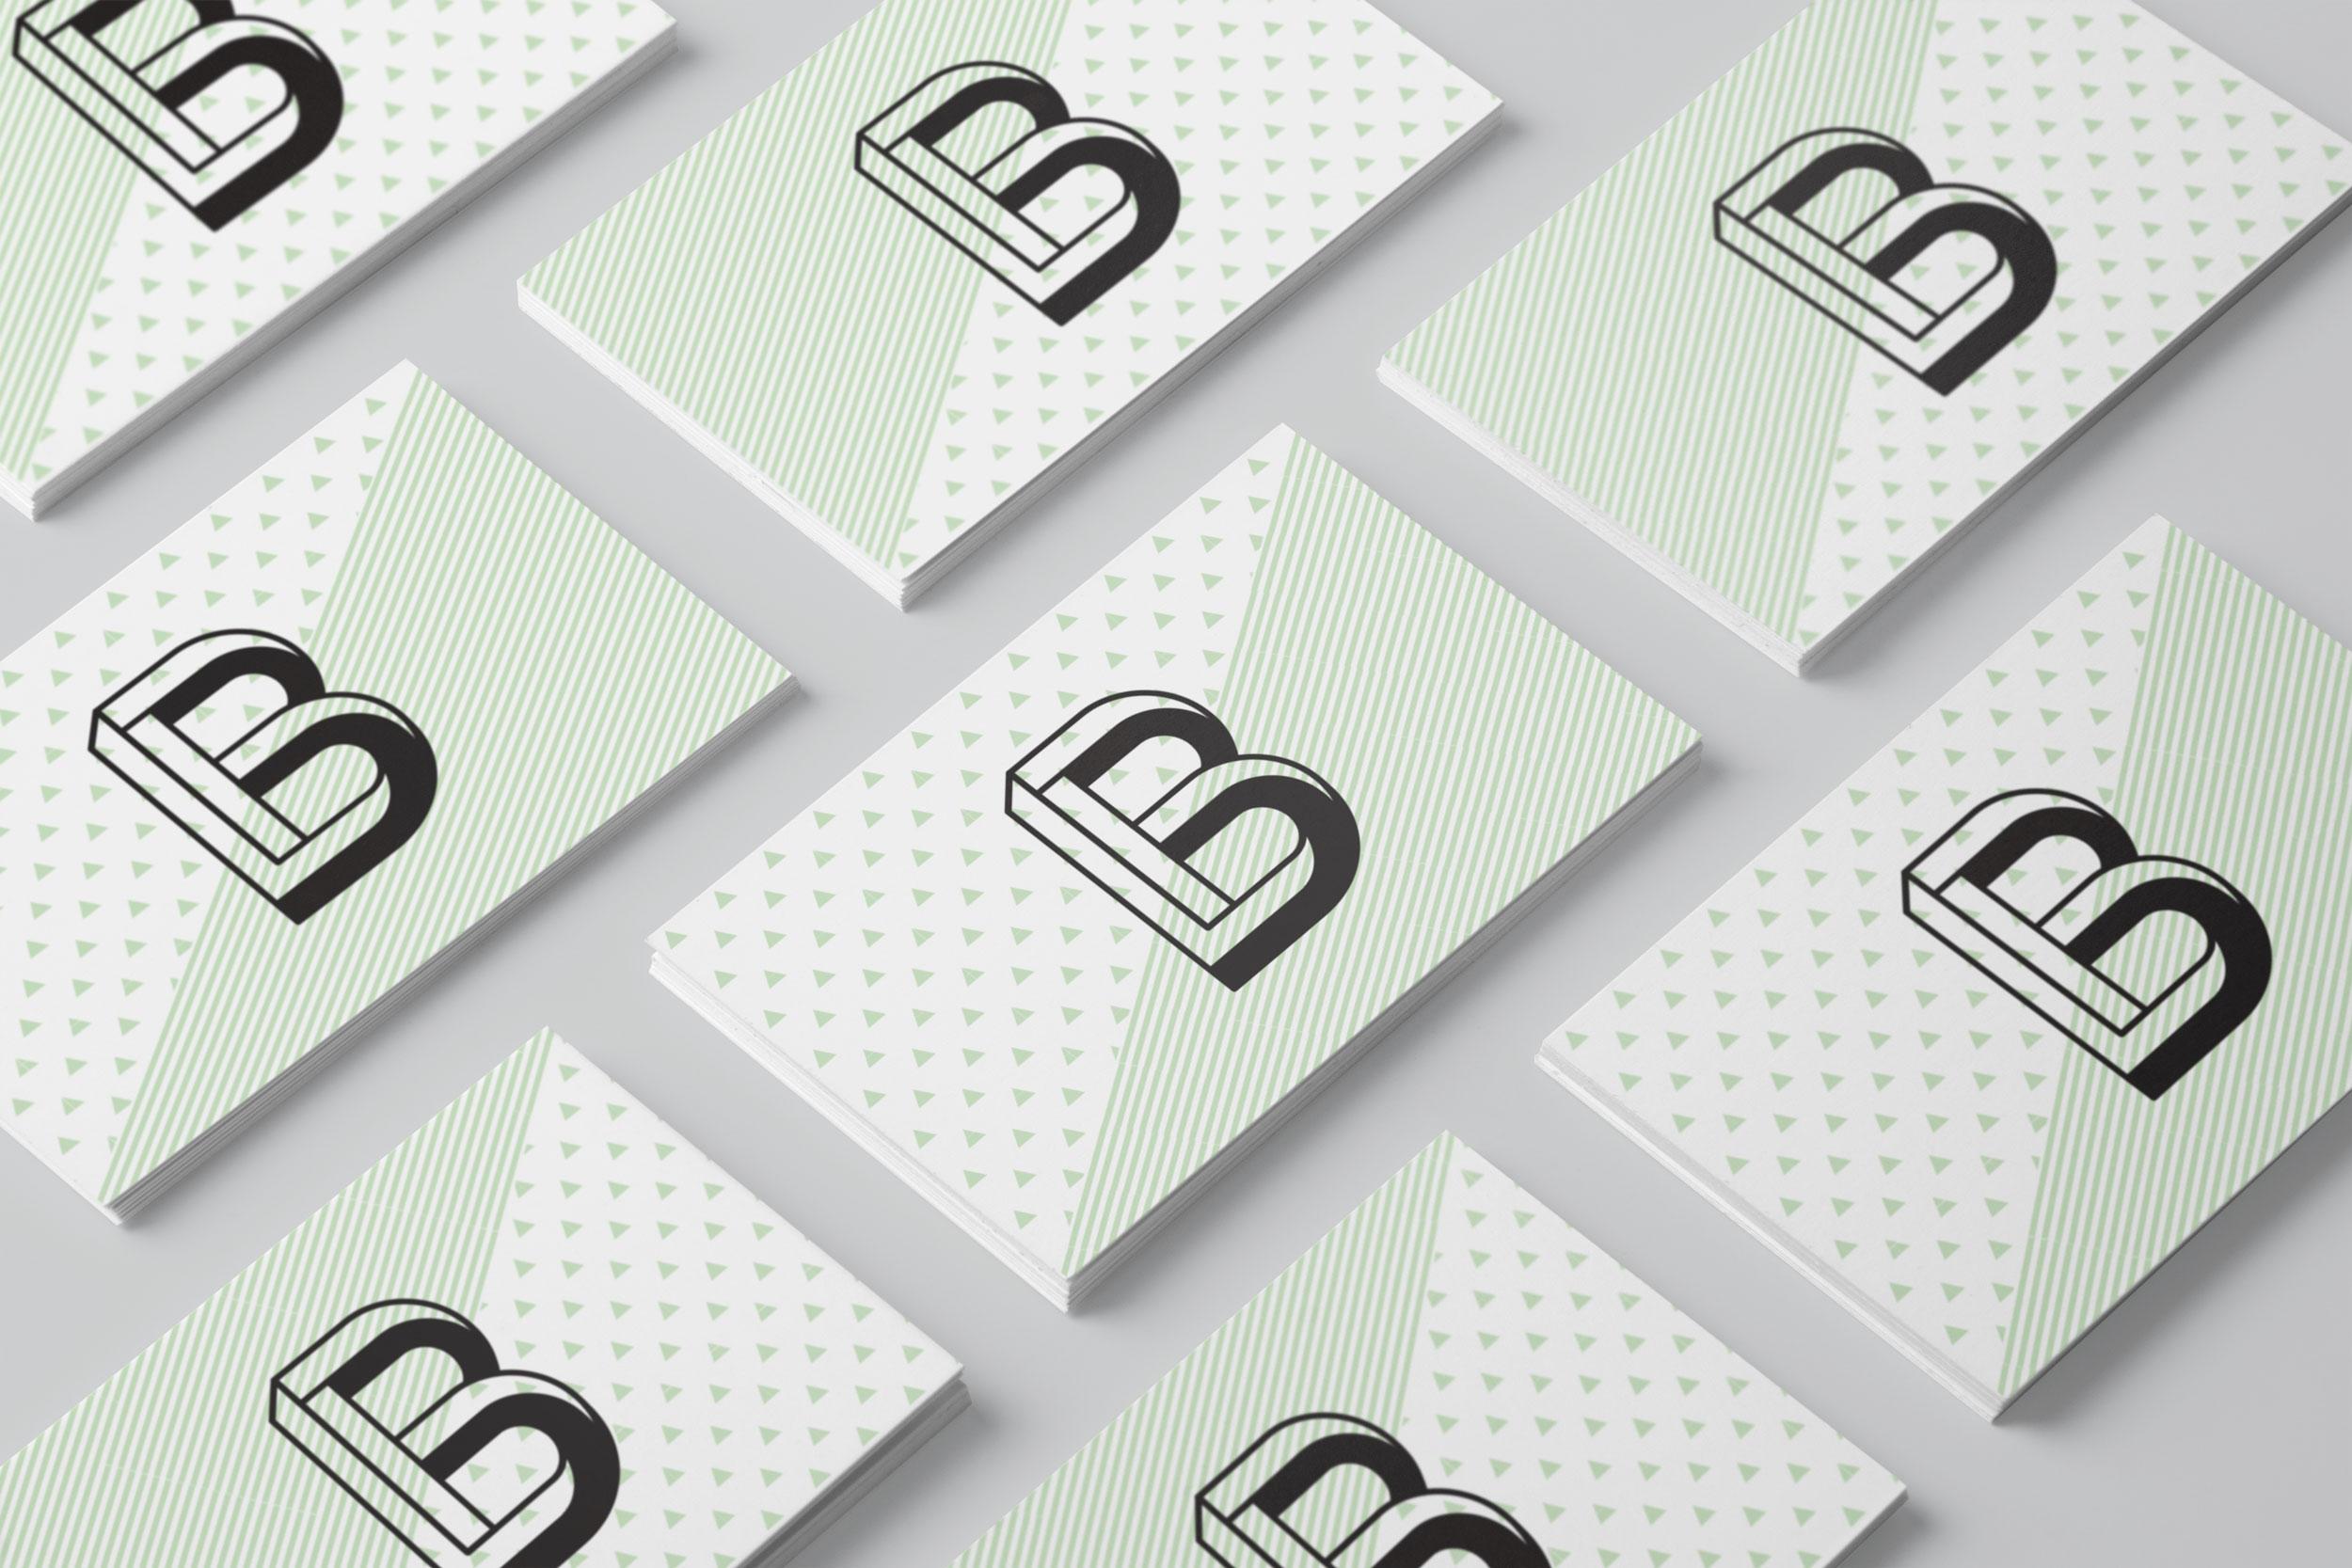 Business card design for born in brunswick, melbourne logo design, logo design melbourne